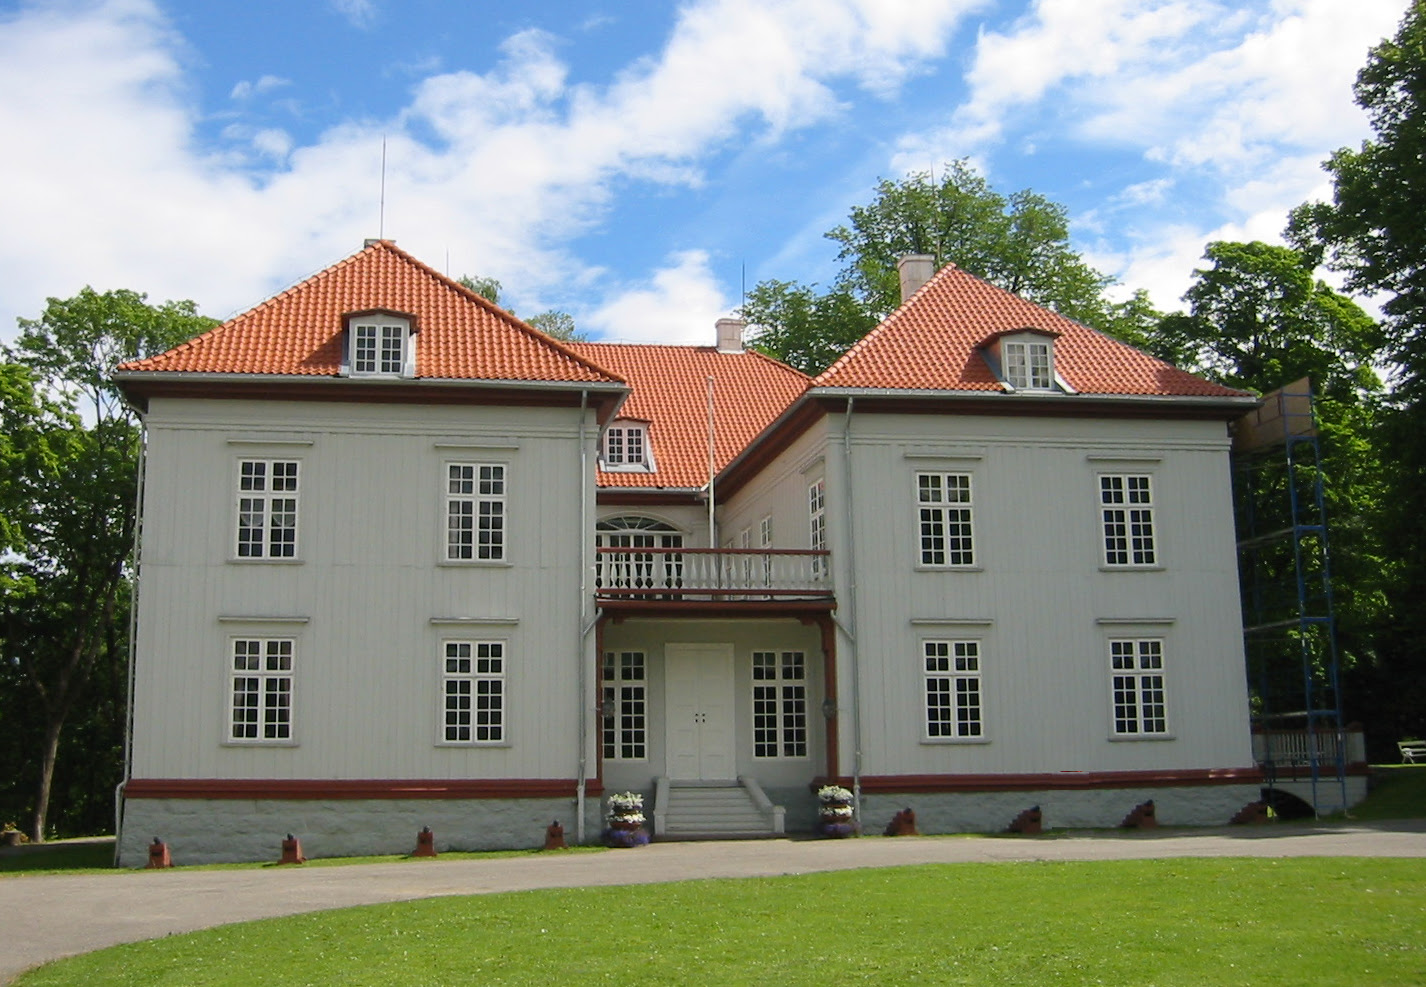 Kjetil Bjørnsrud: Eidsvold Manor